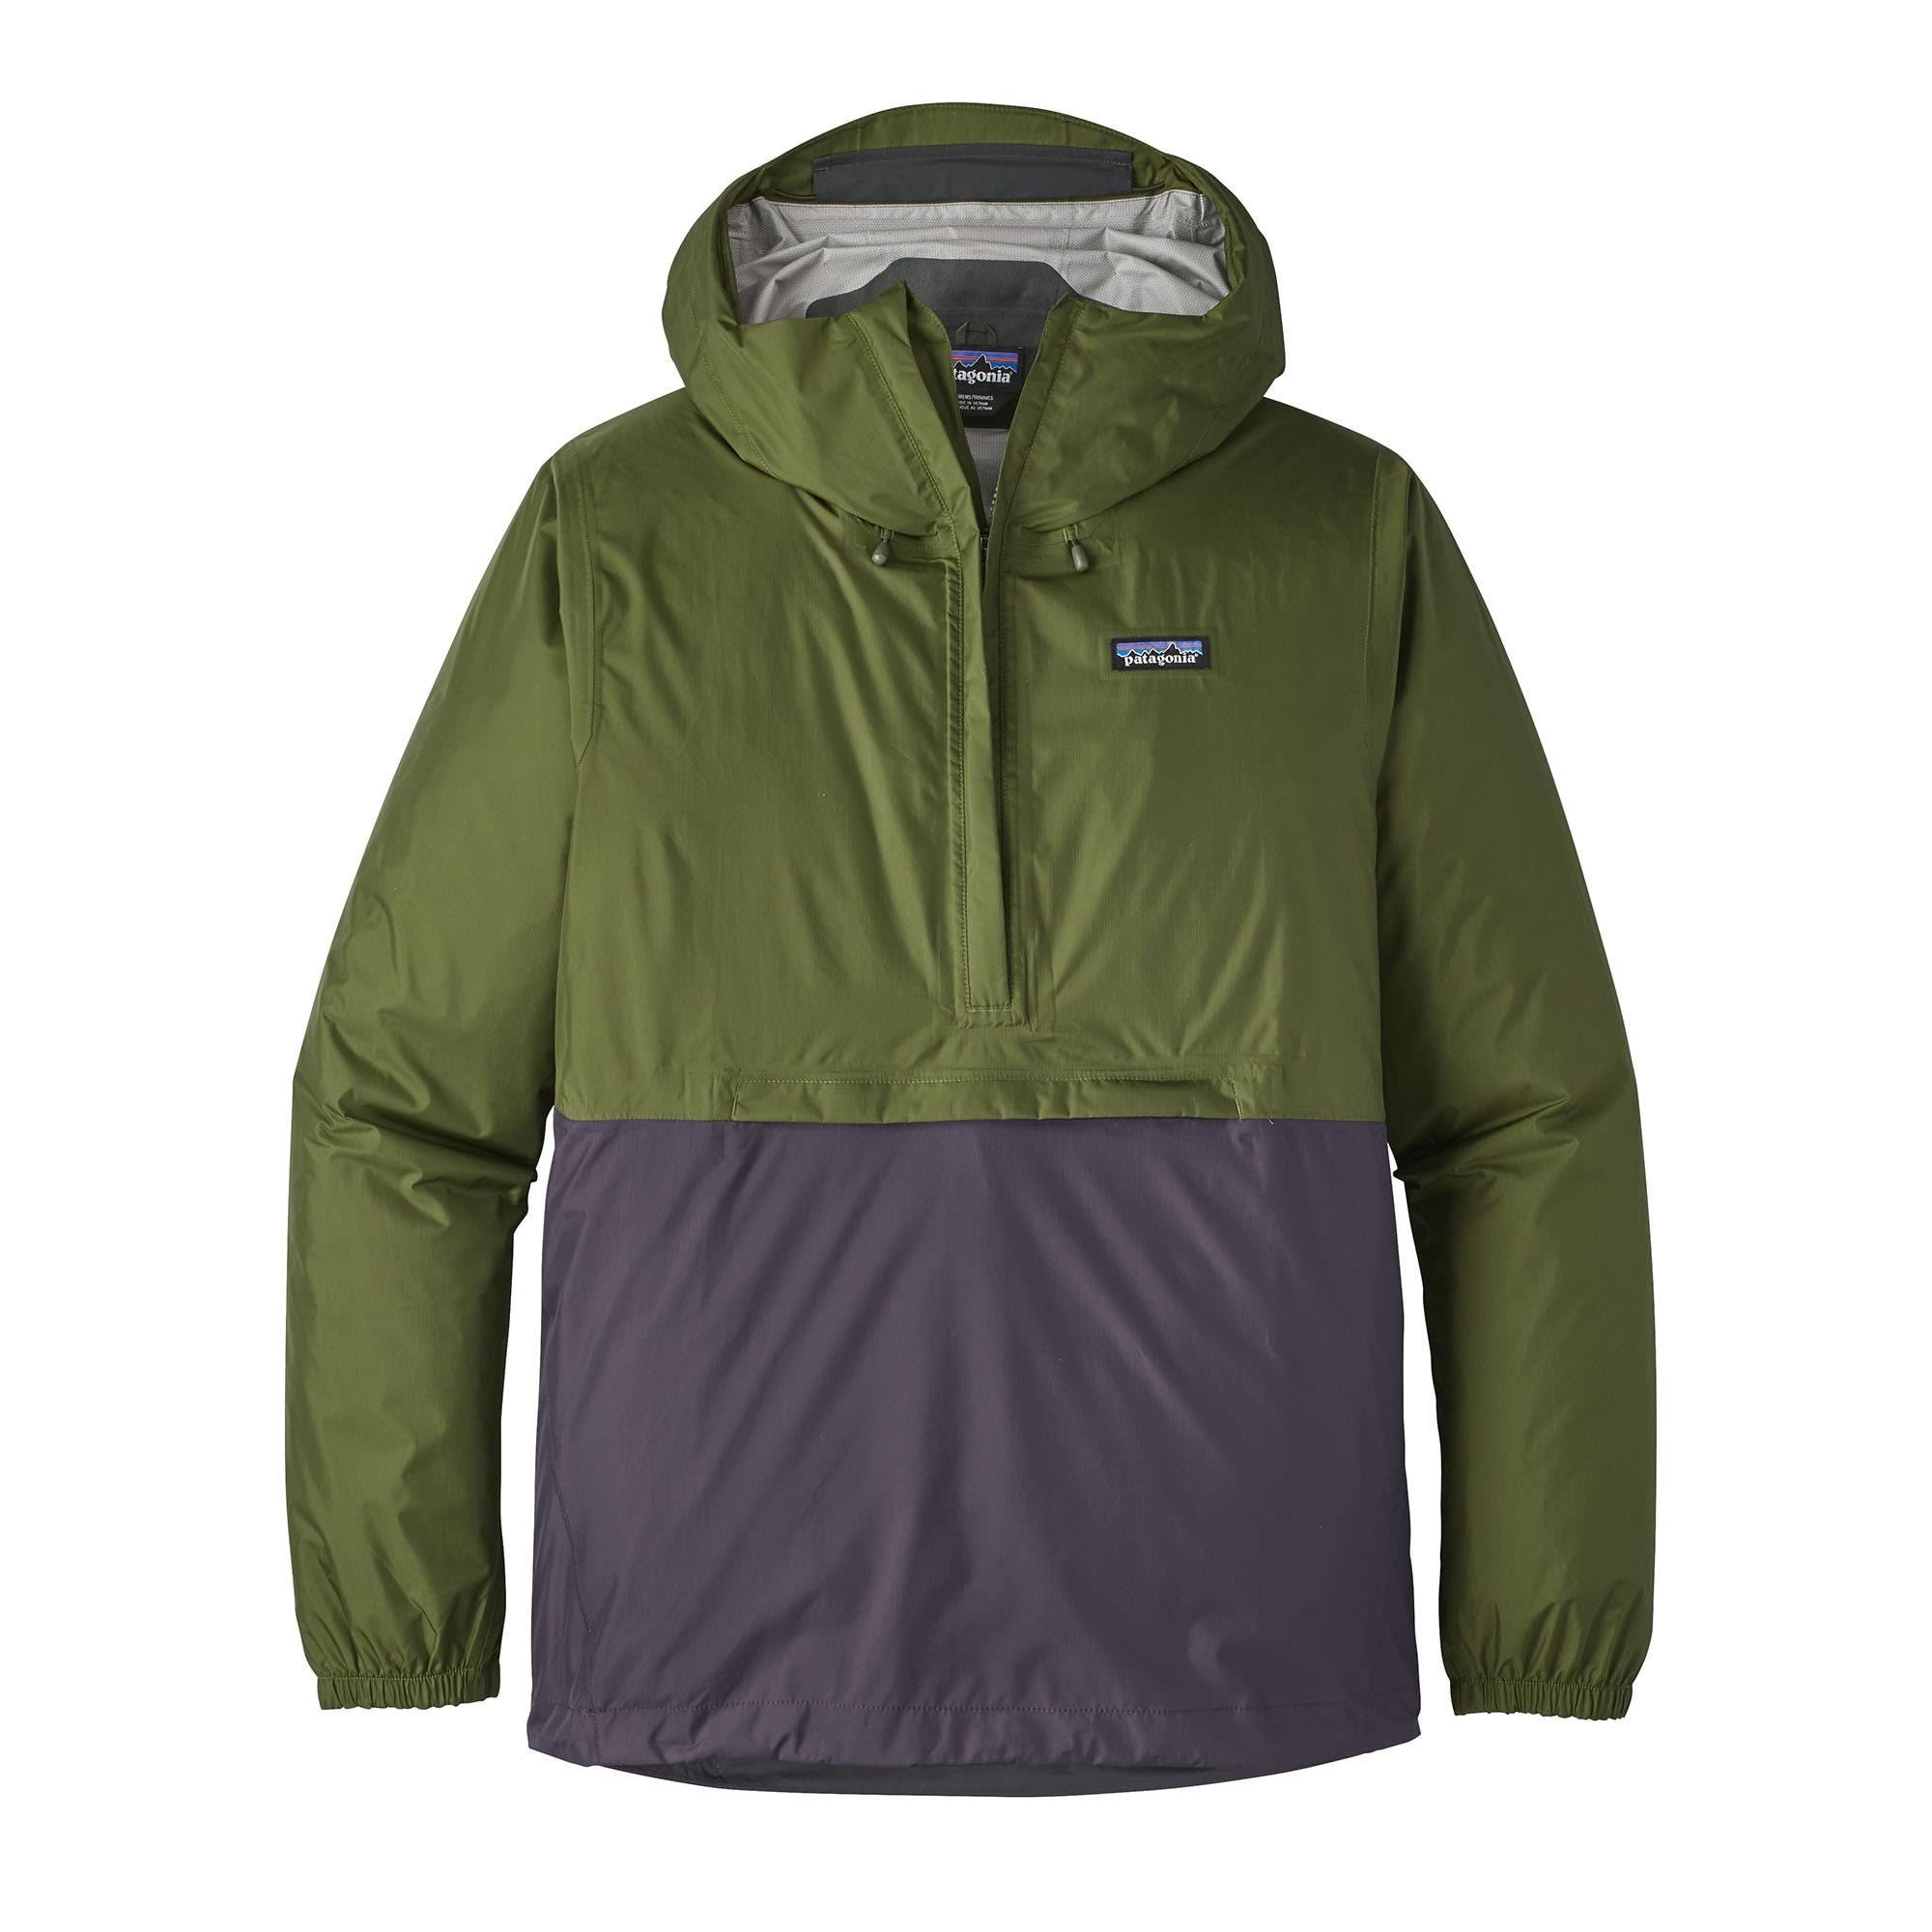 Jersey Torrenthell Patagonia Xl 83932 Verde De Hombre Para Brotado PrUxRPz